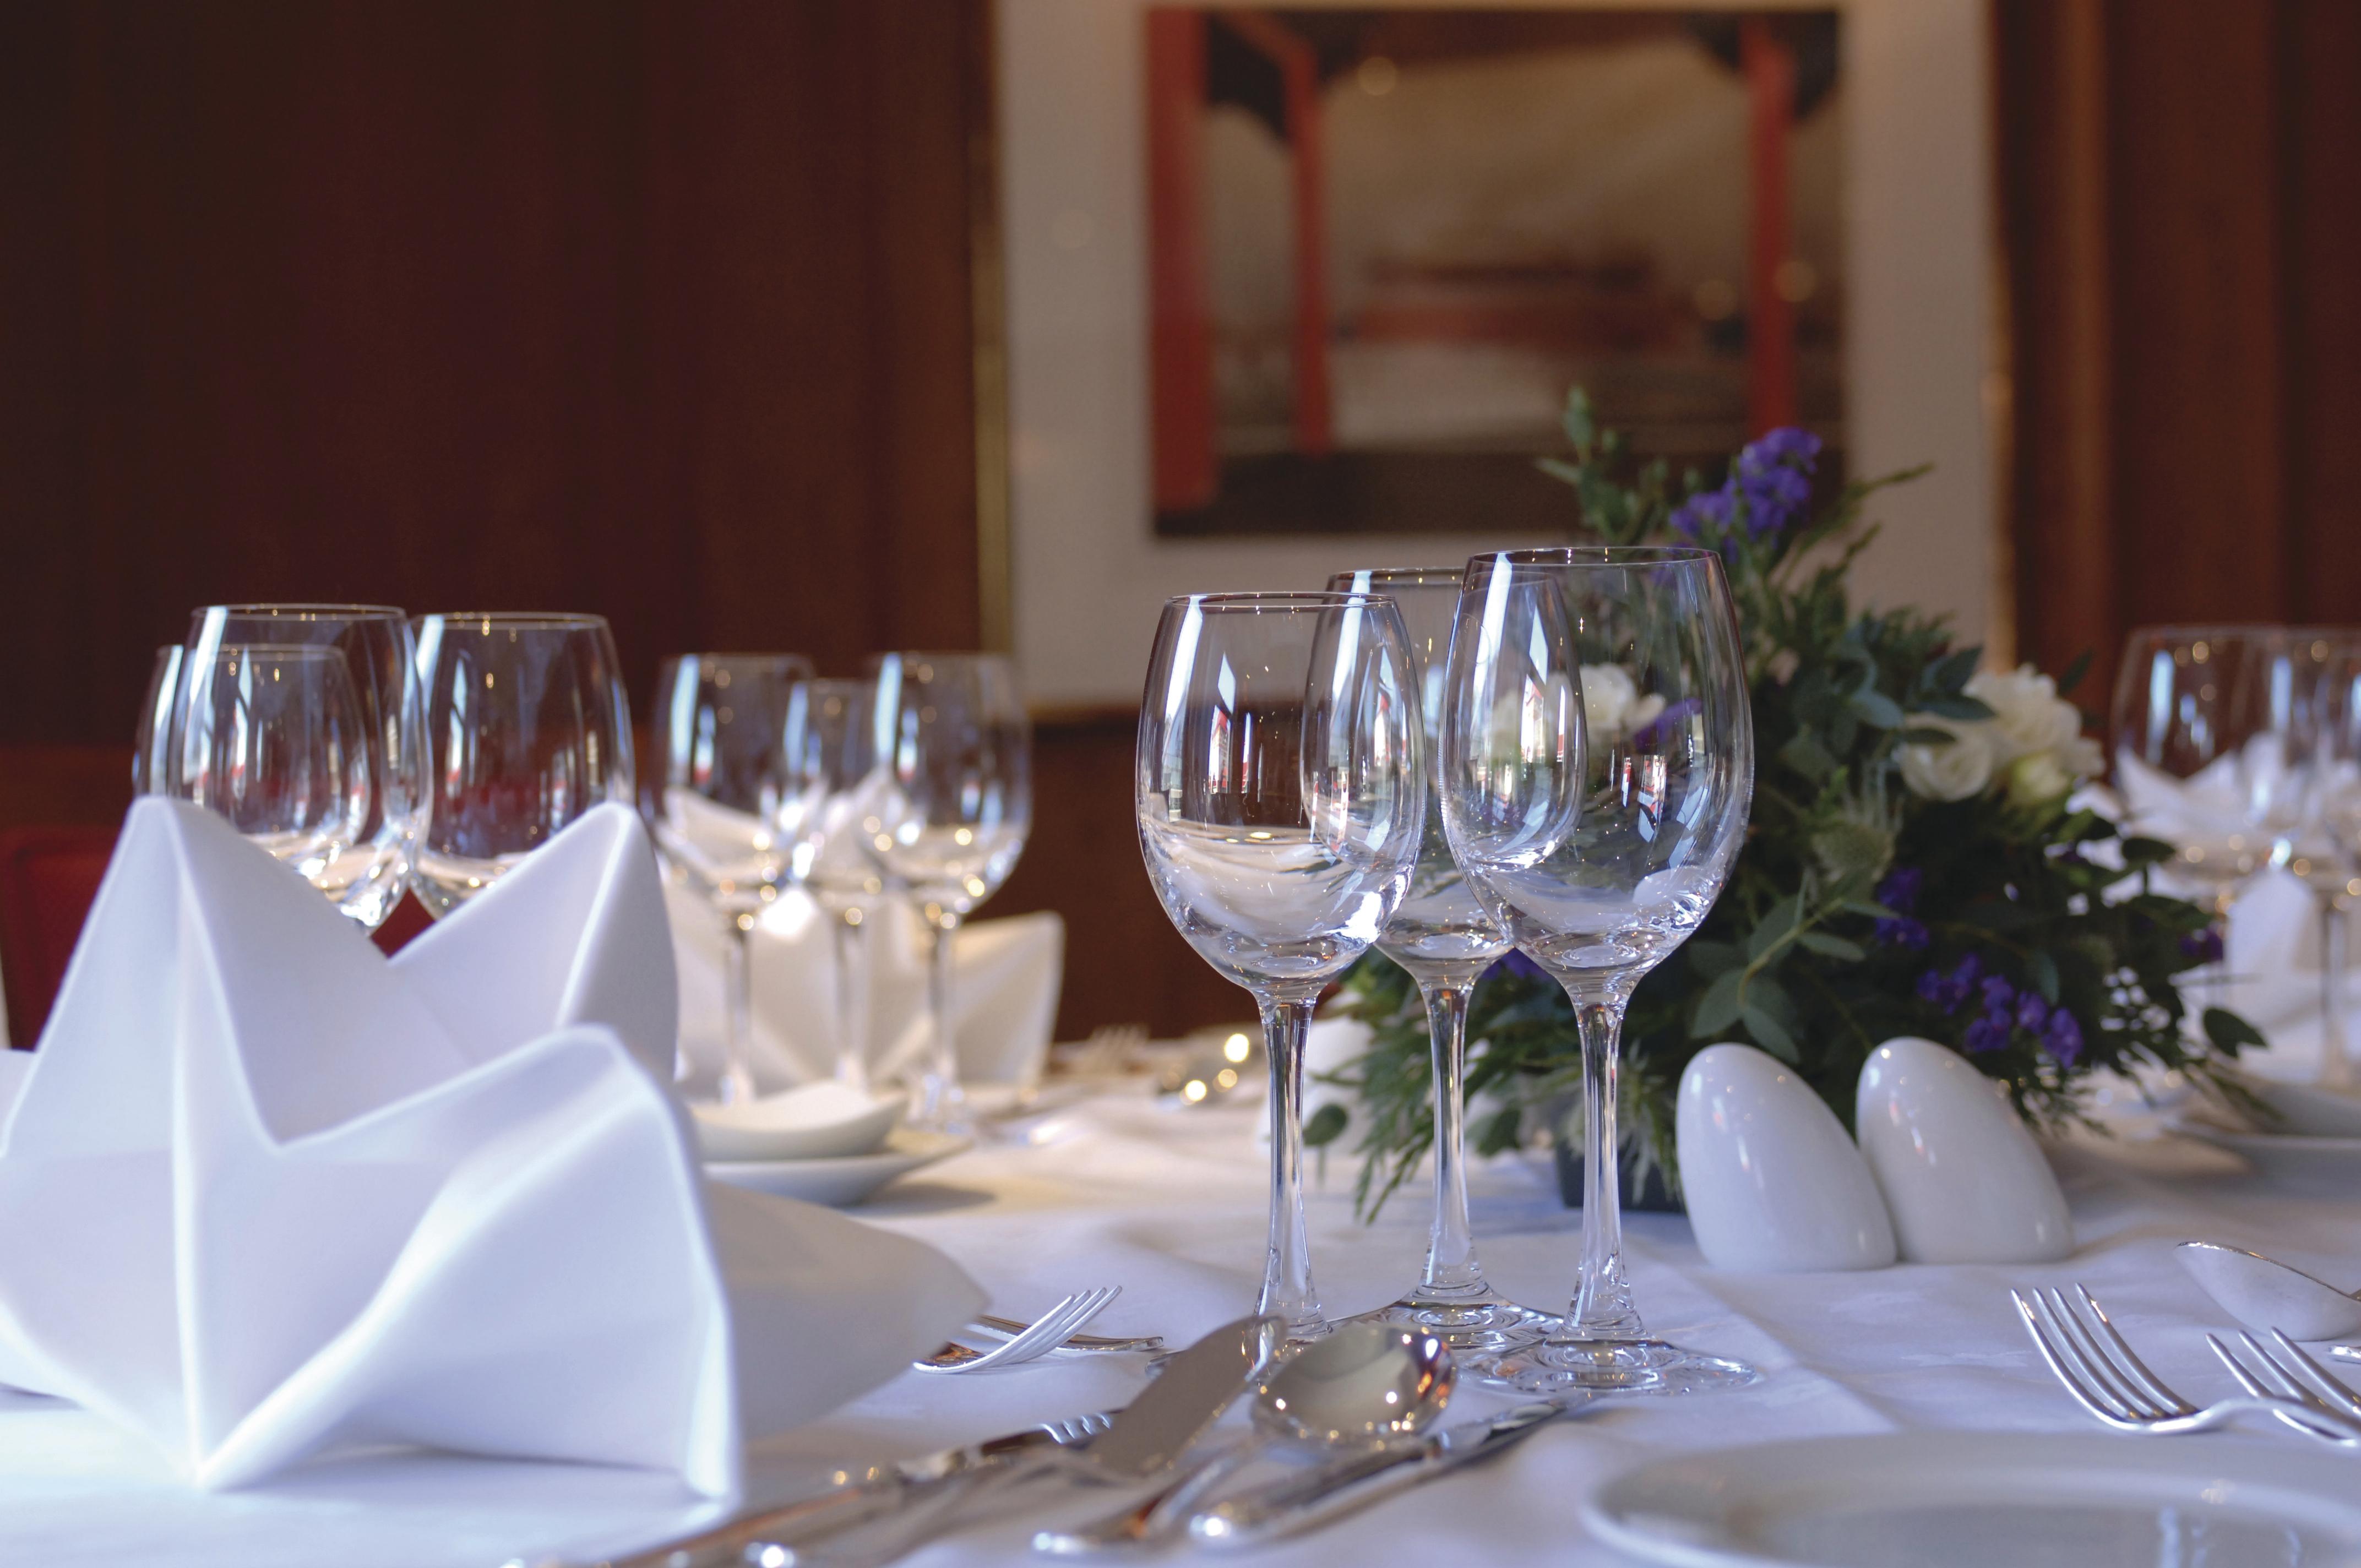 Hebridean Island Cruises Hebridean Princess Interior Columba Restaurant 5.jpg